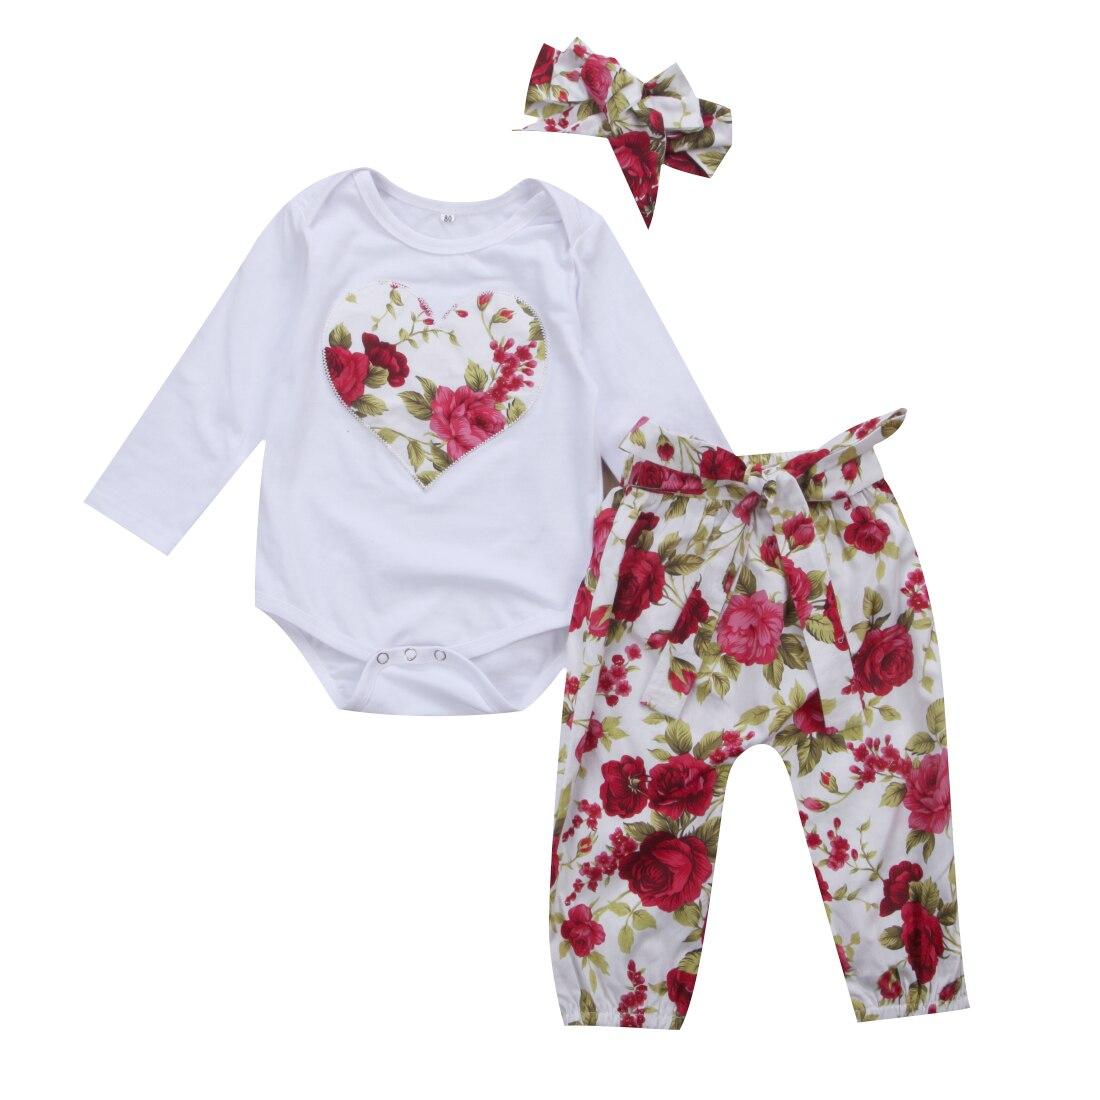 2019 Brand New Newborn Baby Girl Floral Clothes Romper Babygrow Jumpsuit Bodysuit + Long Pants Outfit Kids Clothes Set